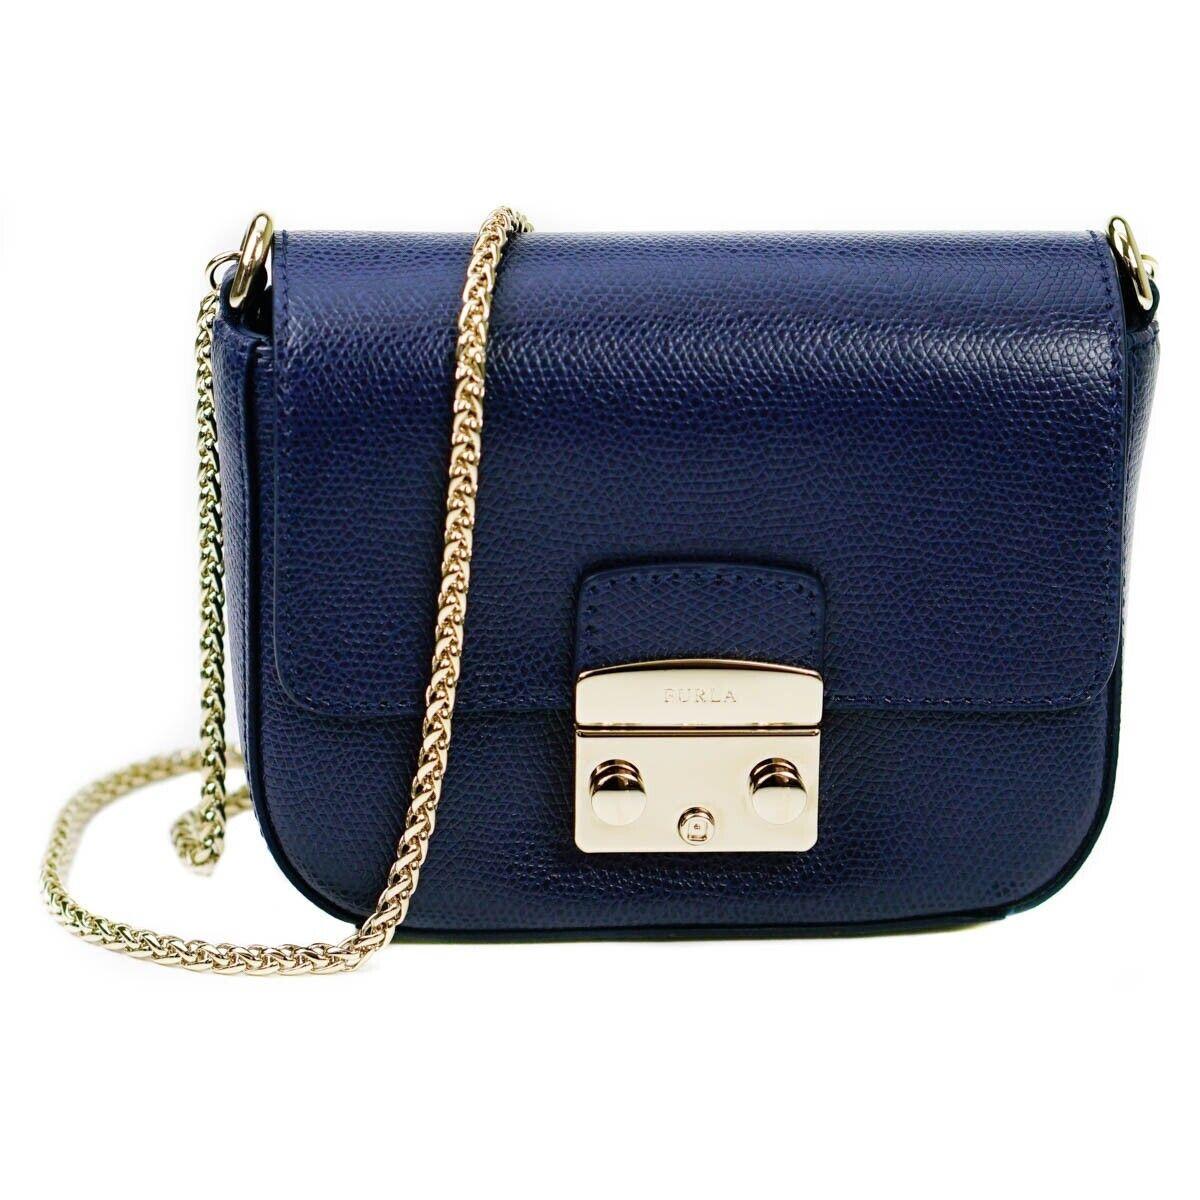 free shipping professional sale where can i buy Furla Metropolis Mini Crossbody Ladies Handbag Blue Leather Fashion  Accessory